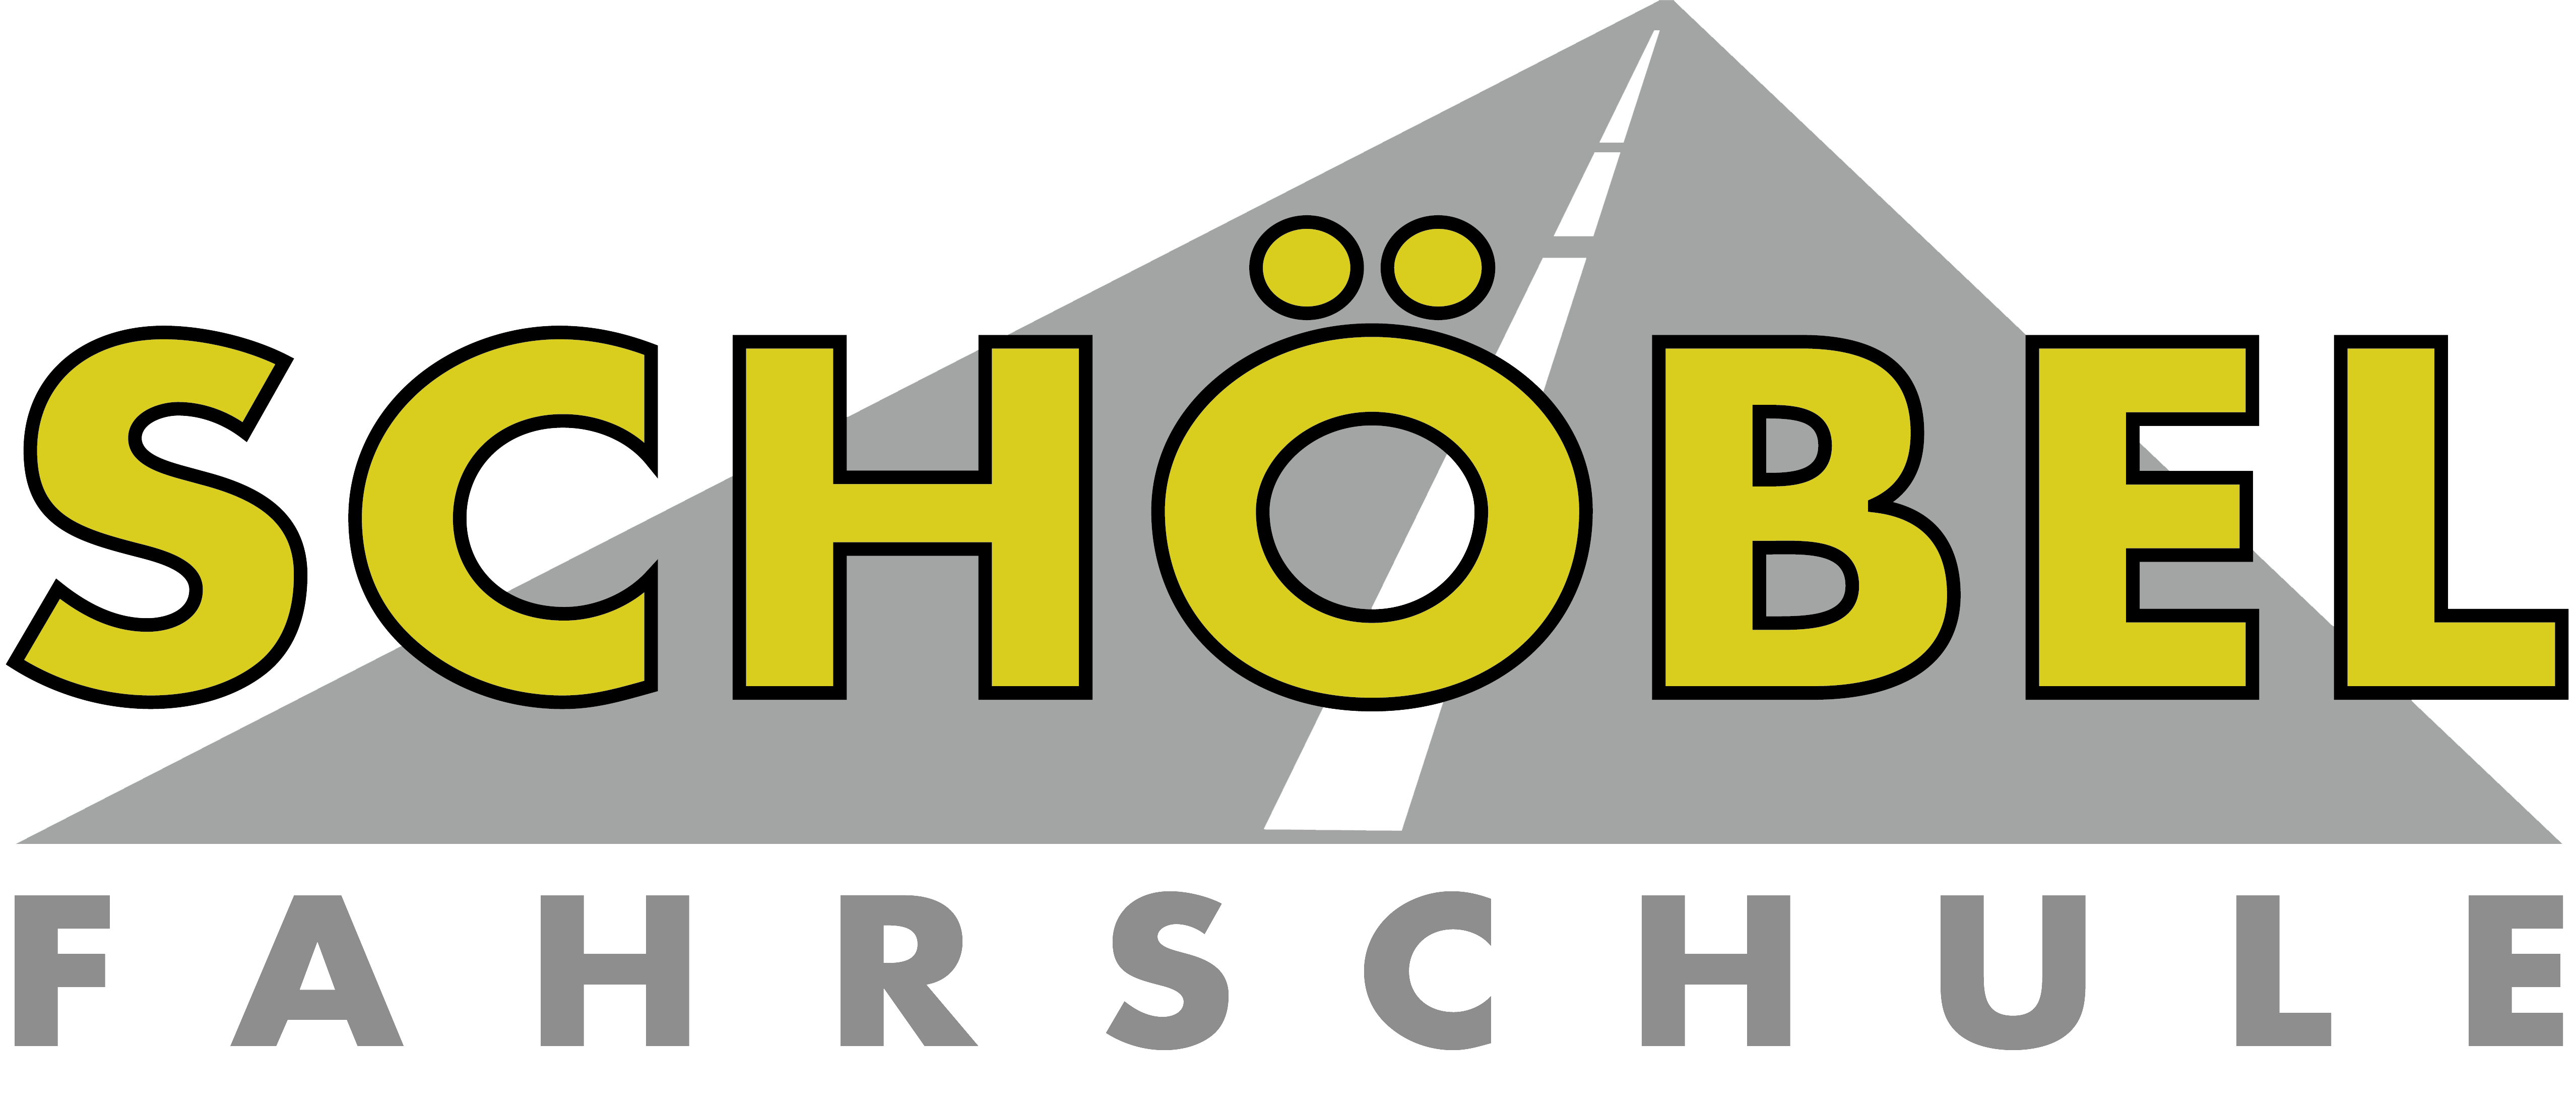 Fahrschule Schoebel | Deine Fahrschule in Ahlen und Beckum